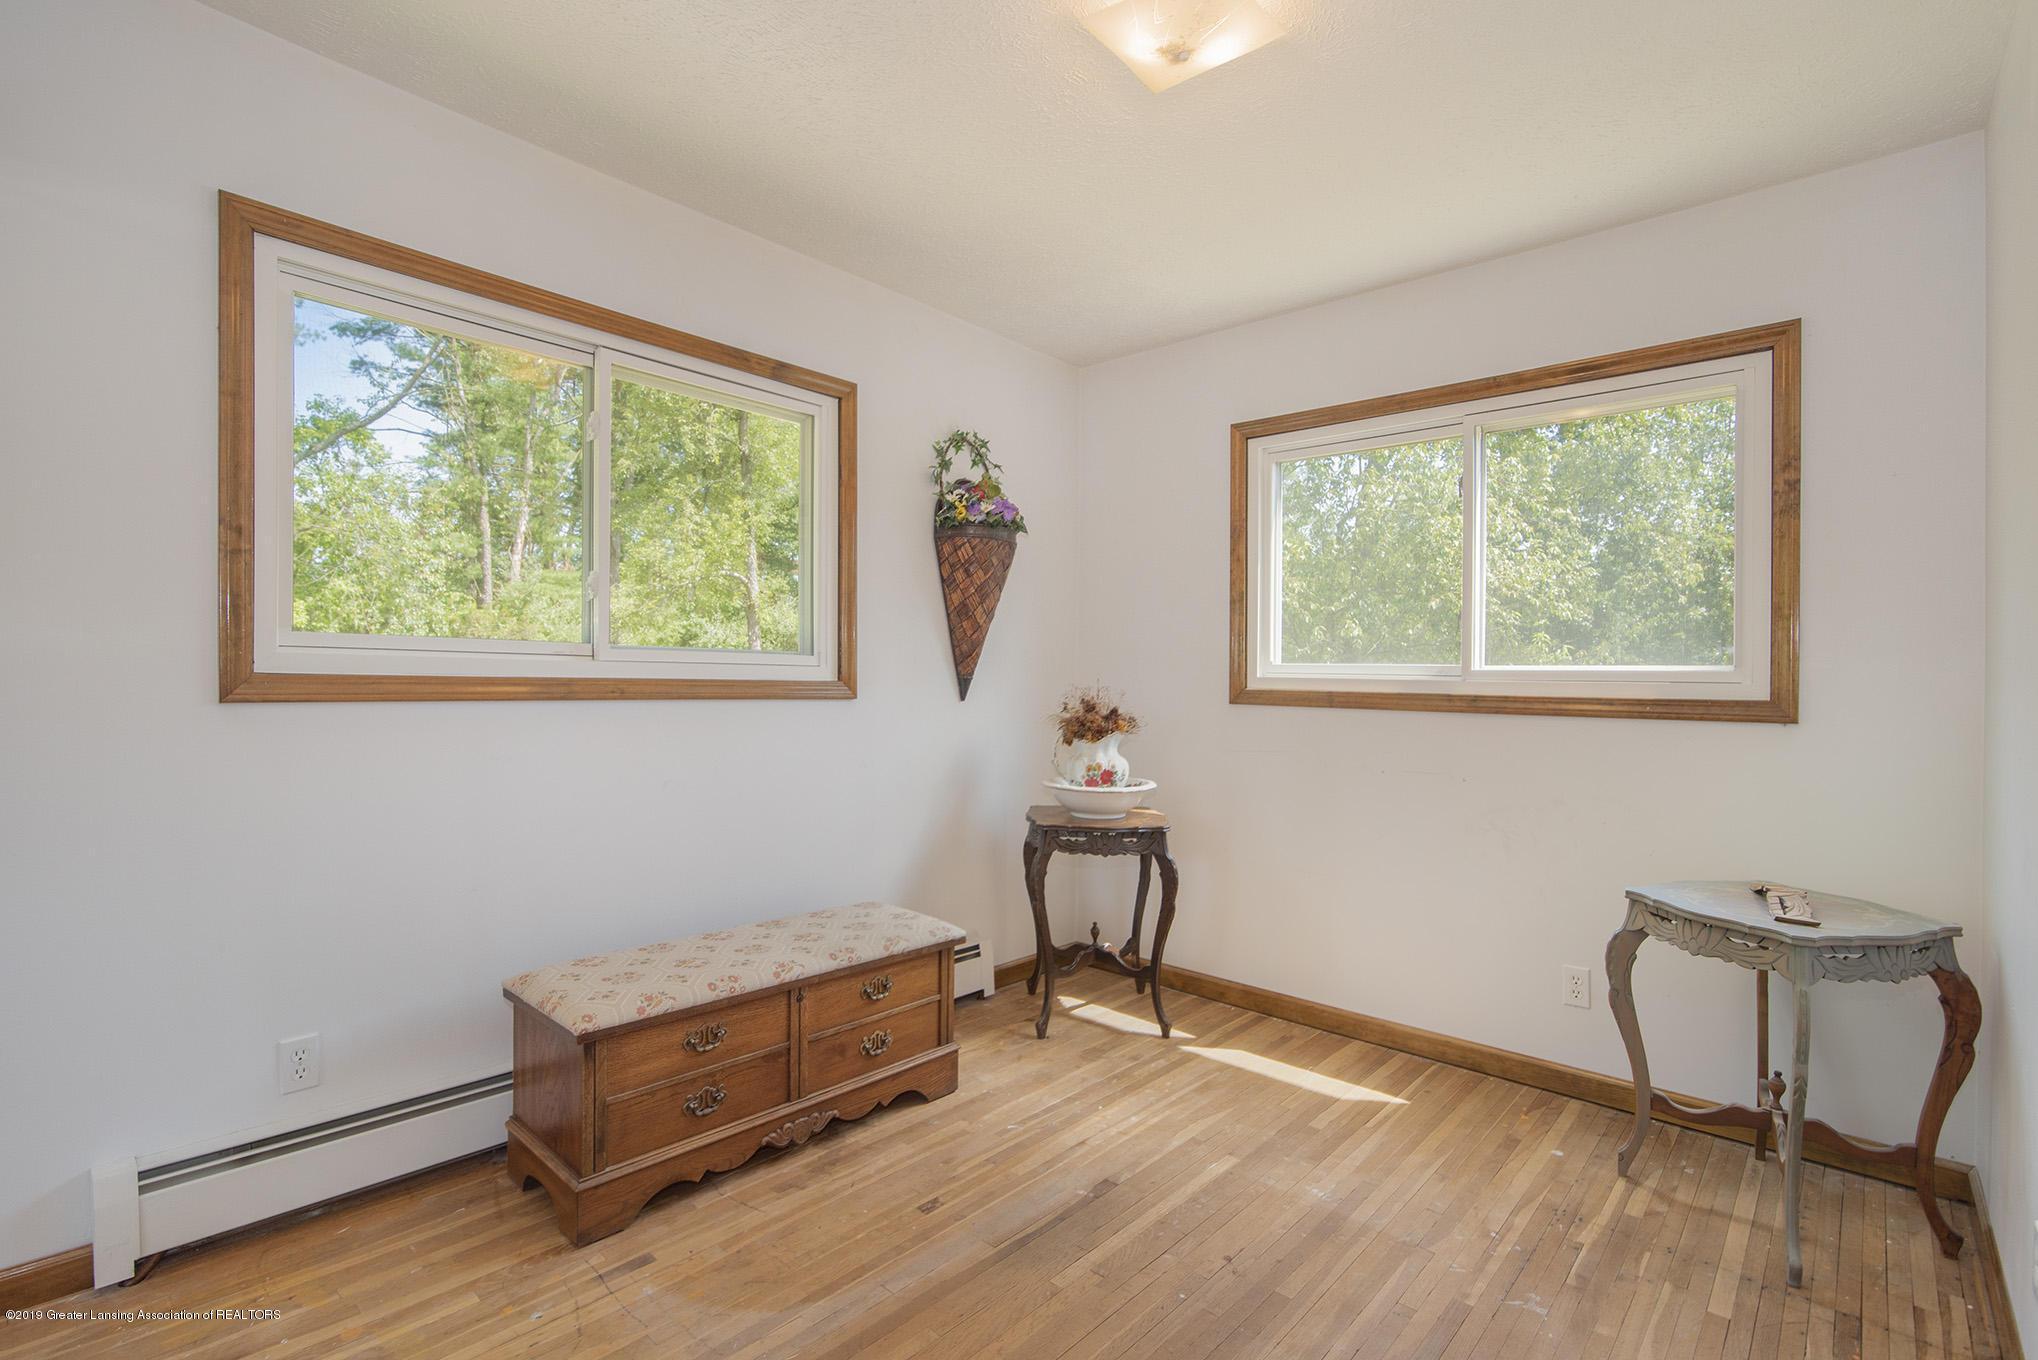 11807 Upton Rd - Bedroom - 16